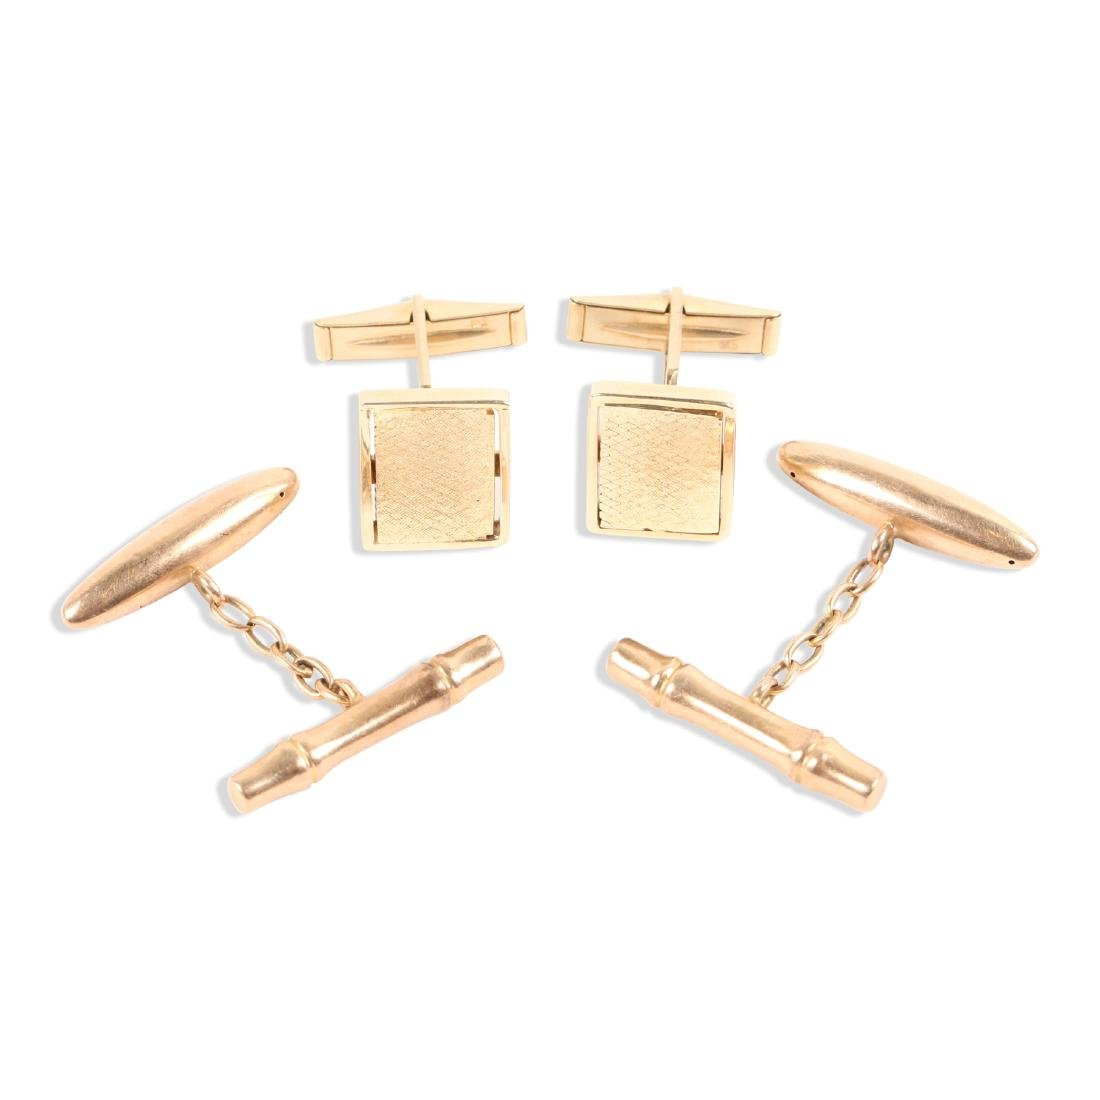 2 Pairs, 10K-15K Gold Cufflinks